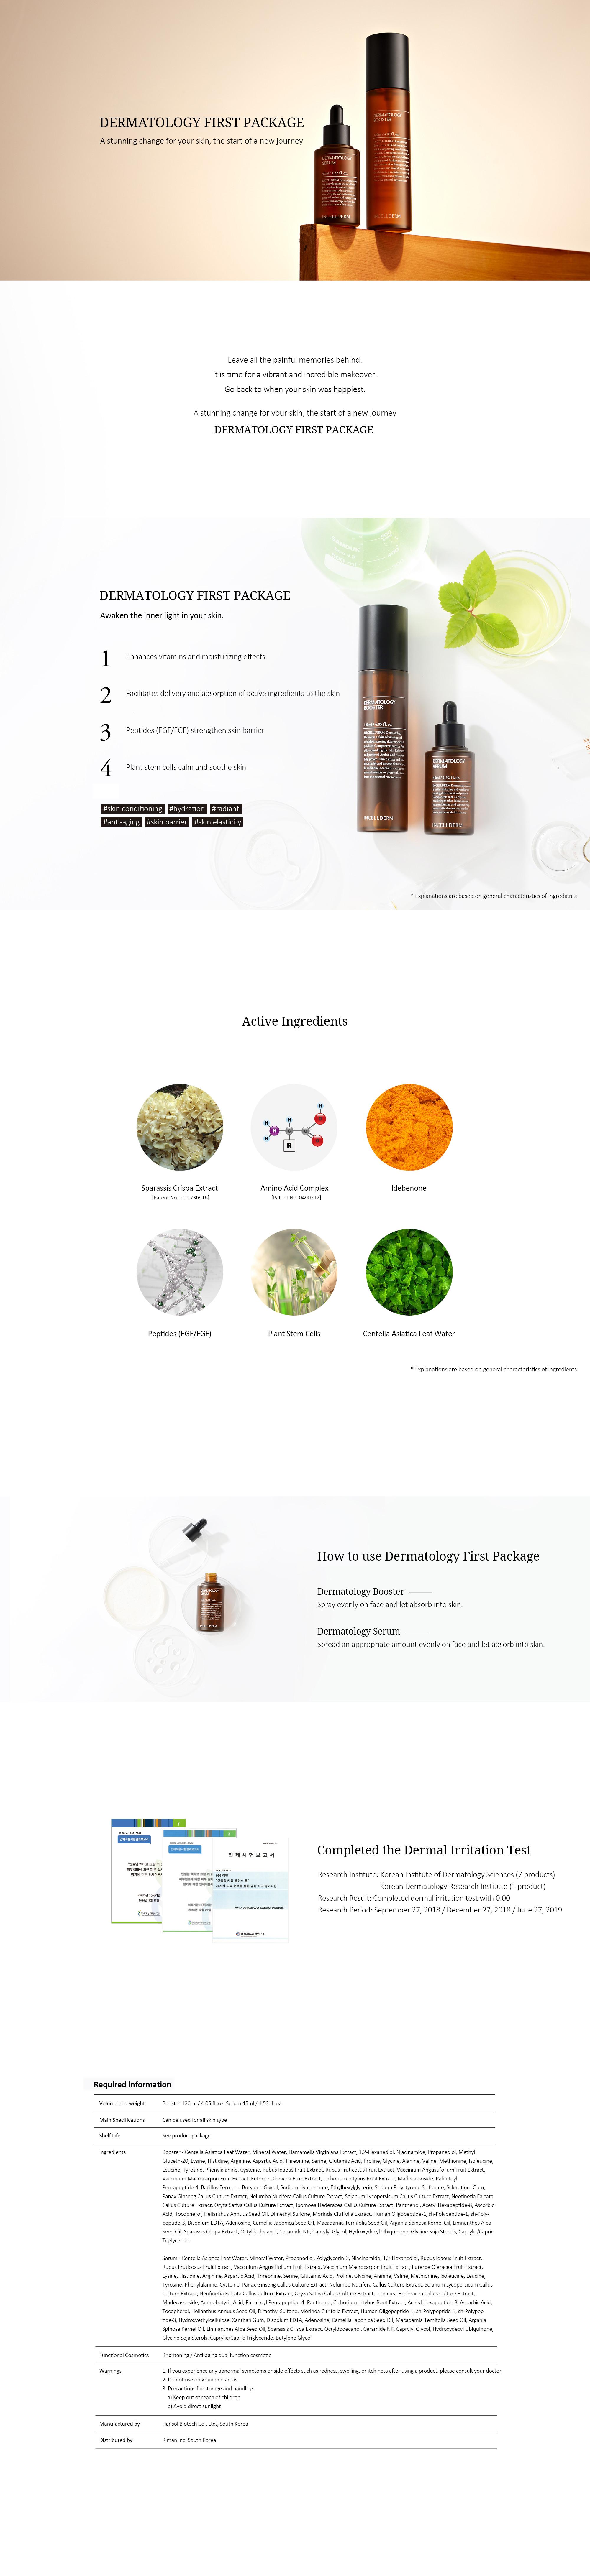 Dermatology First Package.jpg